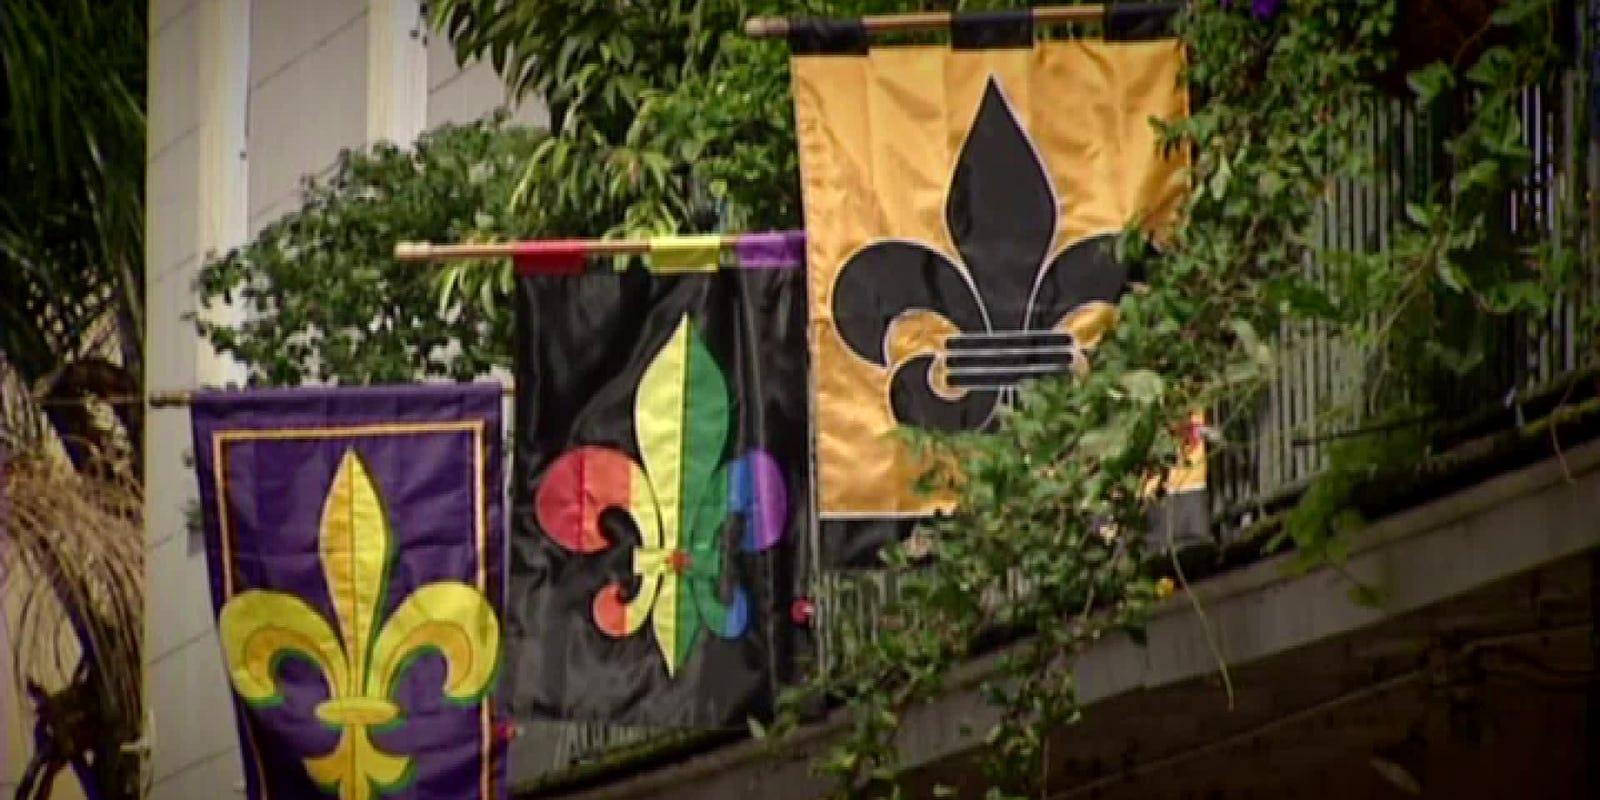 Historians Say Fleur De Lis Has Troubled History